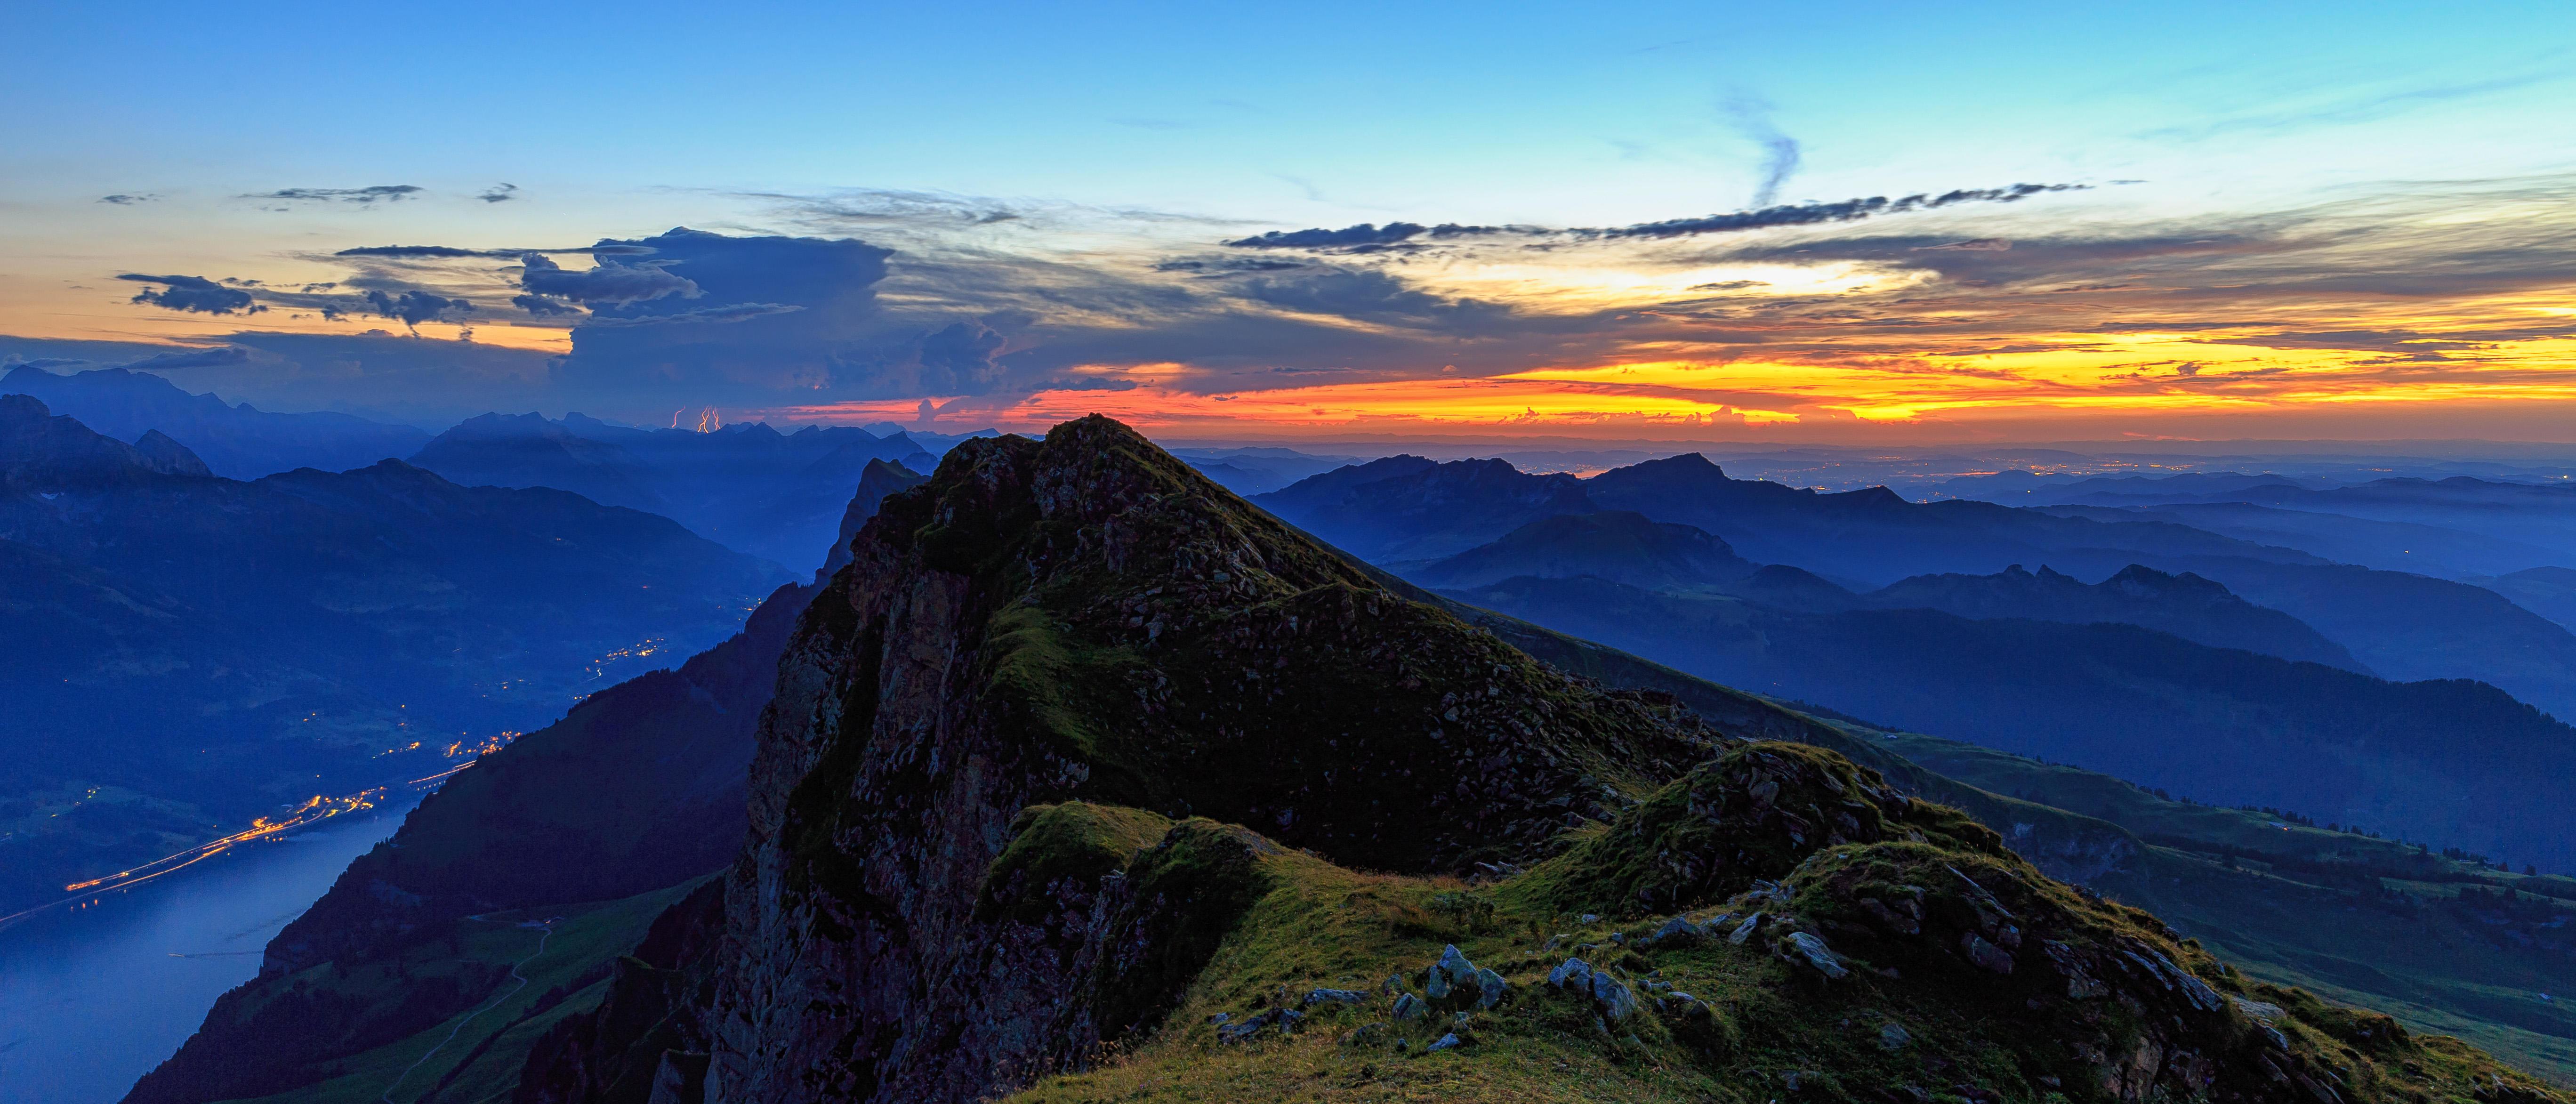 обои Хурфирстен, горный хребет в кантоне, Санкт-Галлен, Швейцария картинки фото